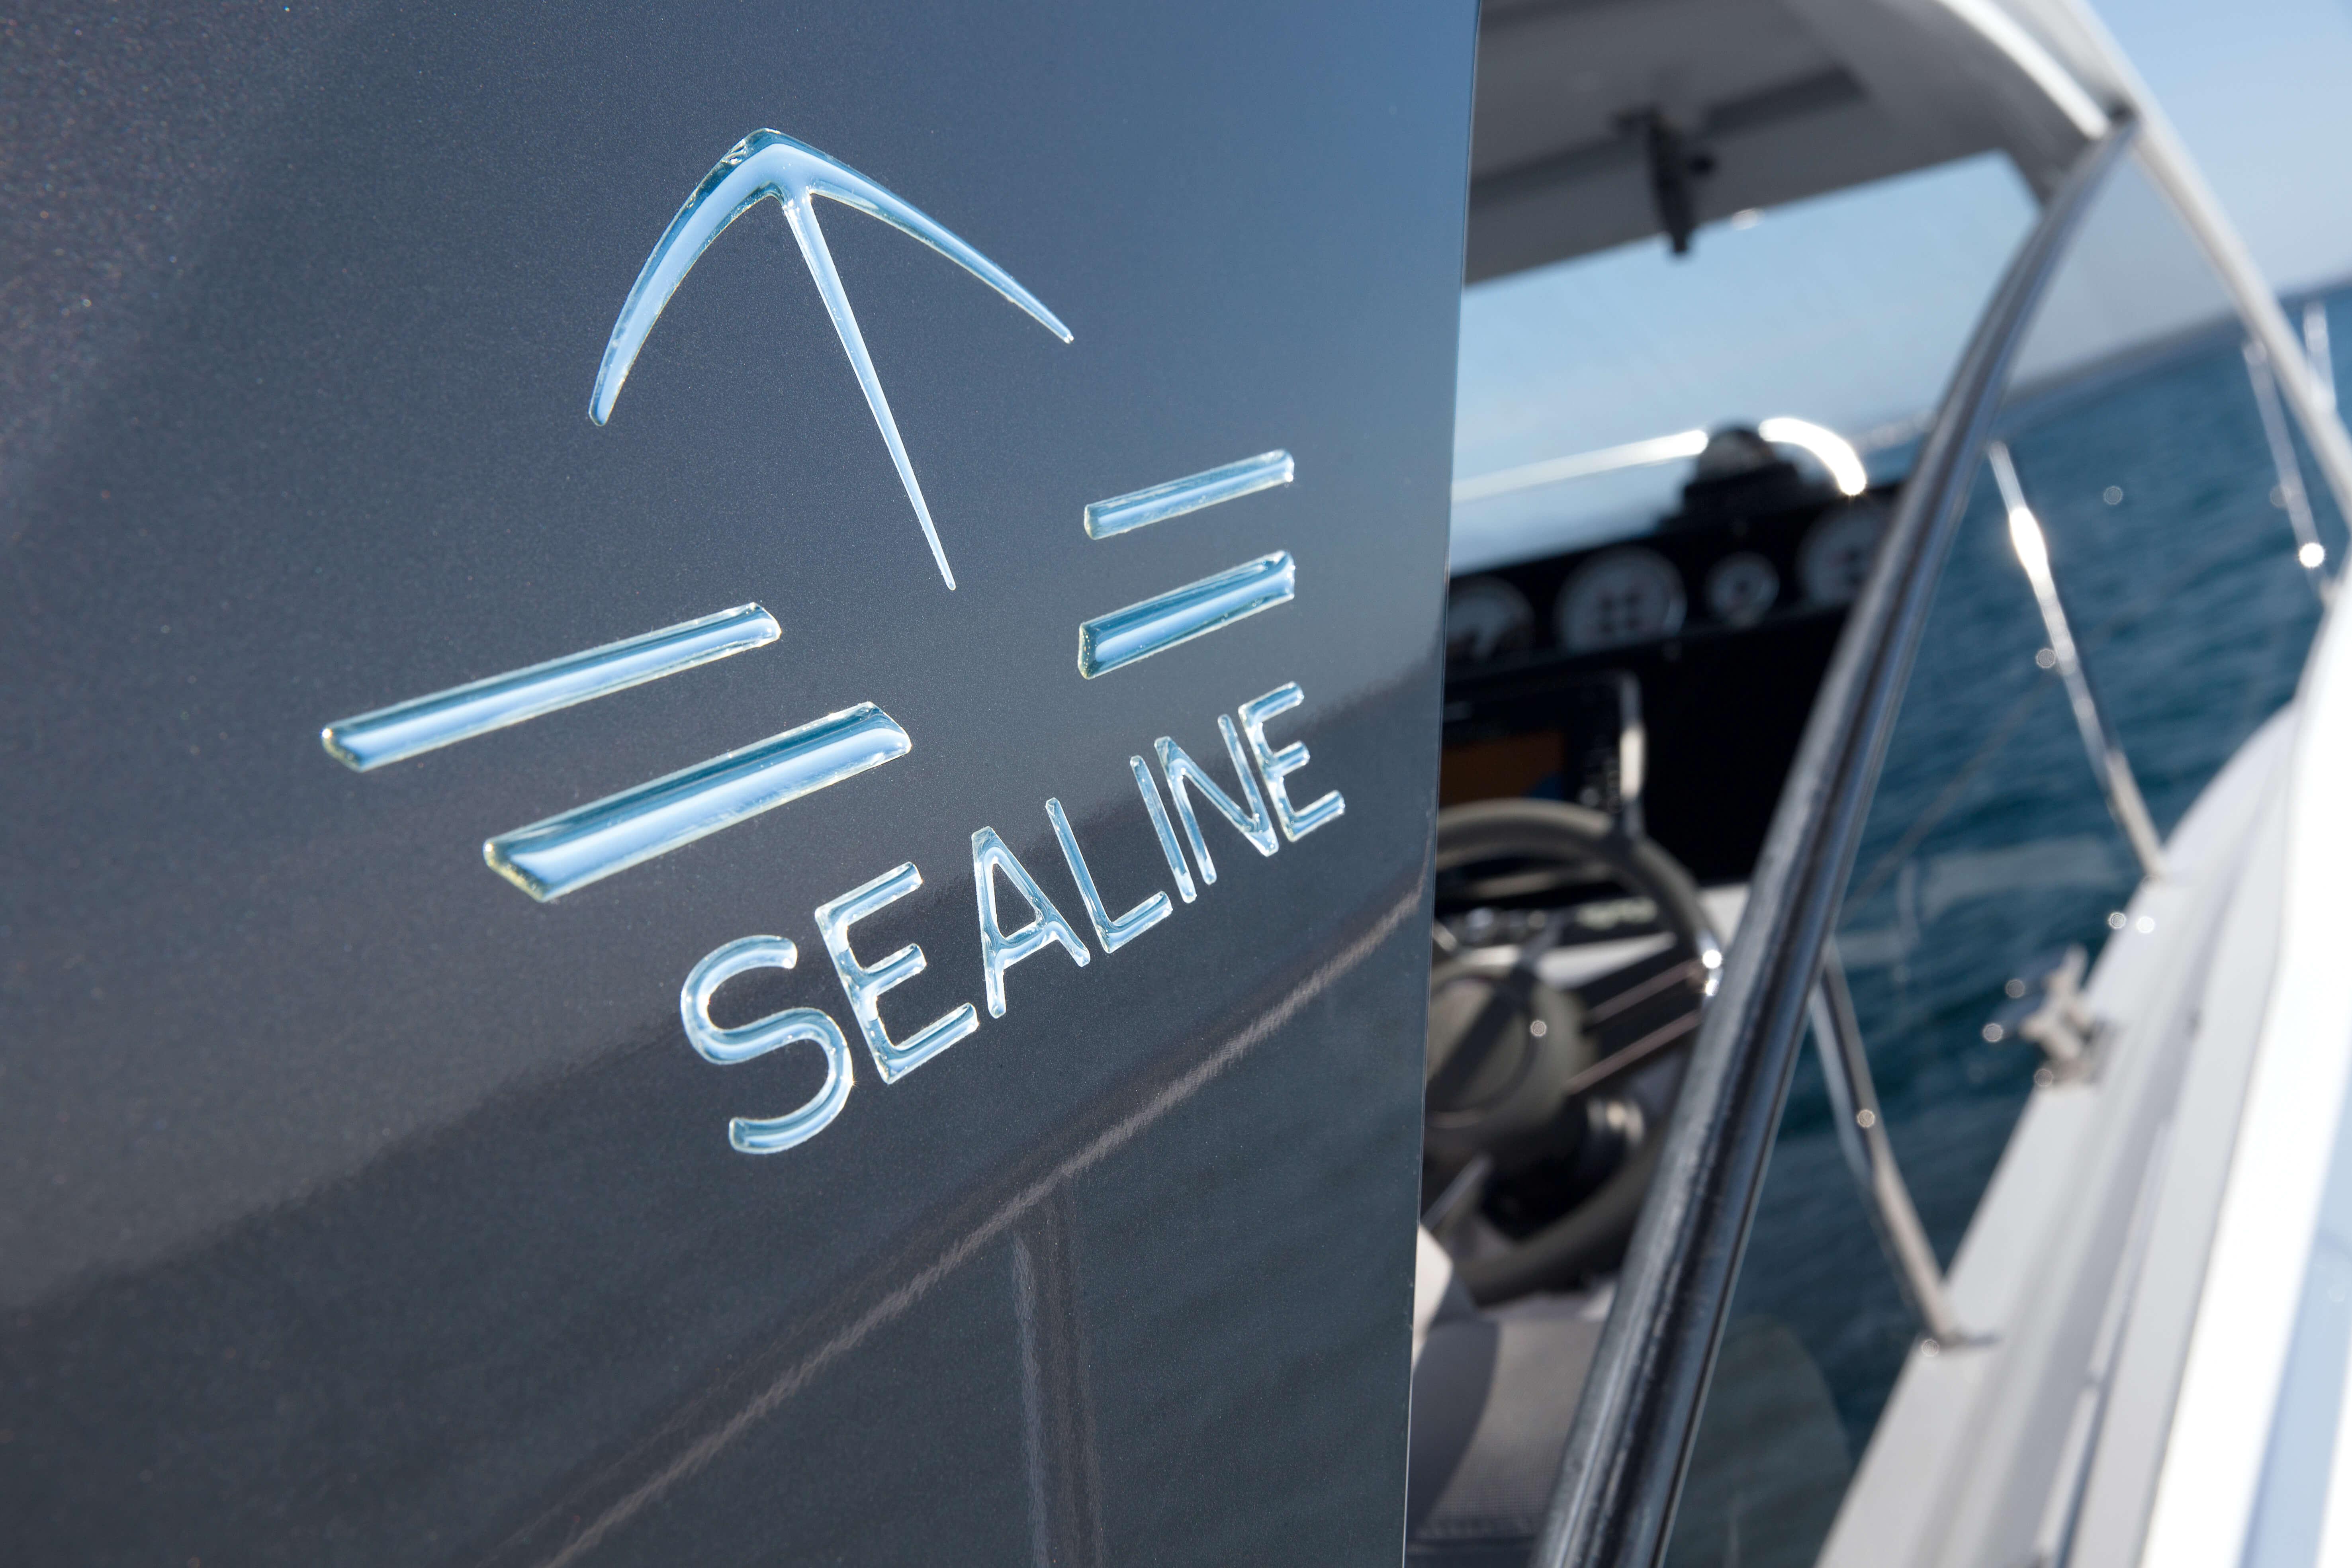 Sealine S330: Exterior